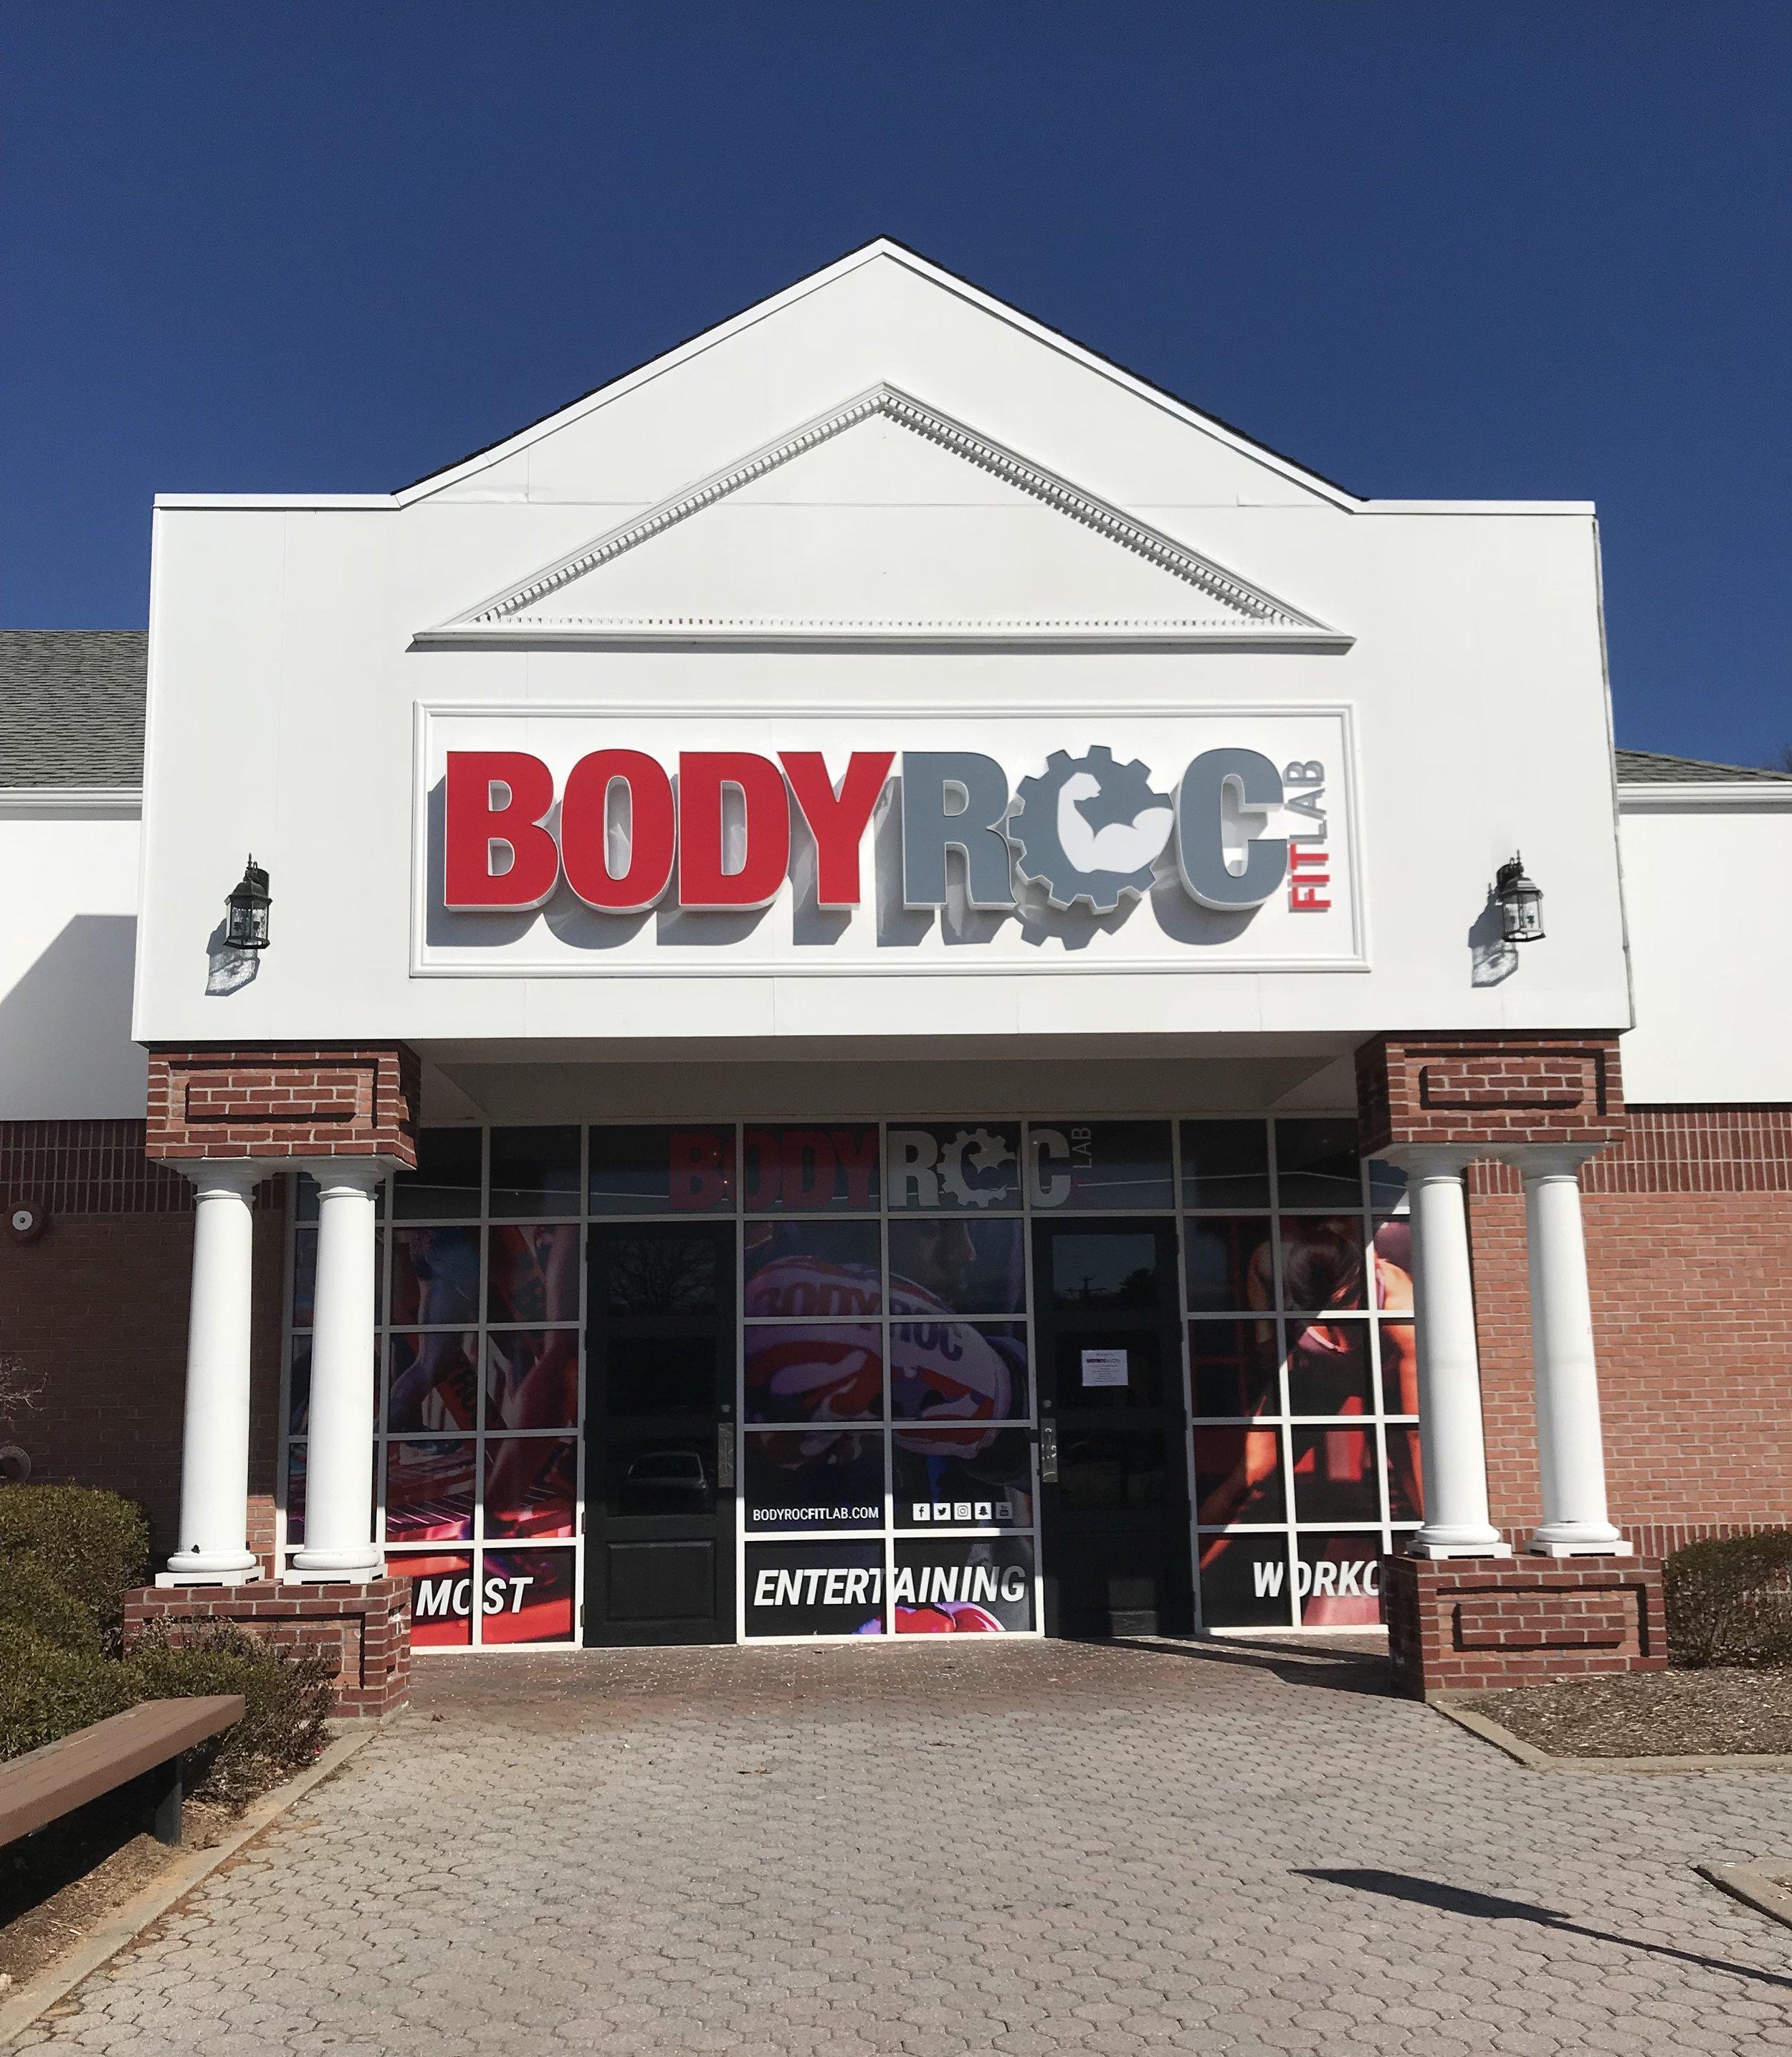 Body Roc copy.jpg